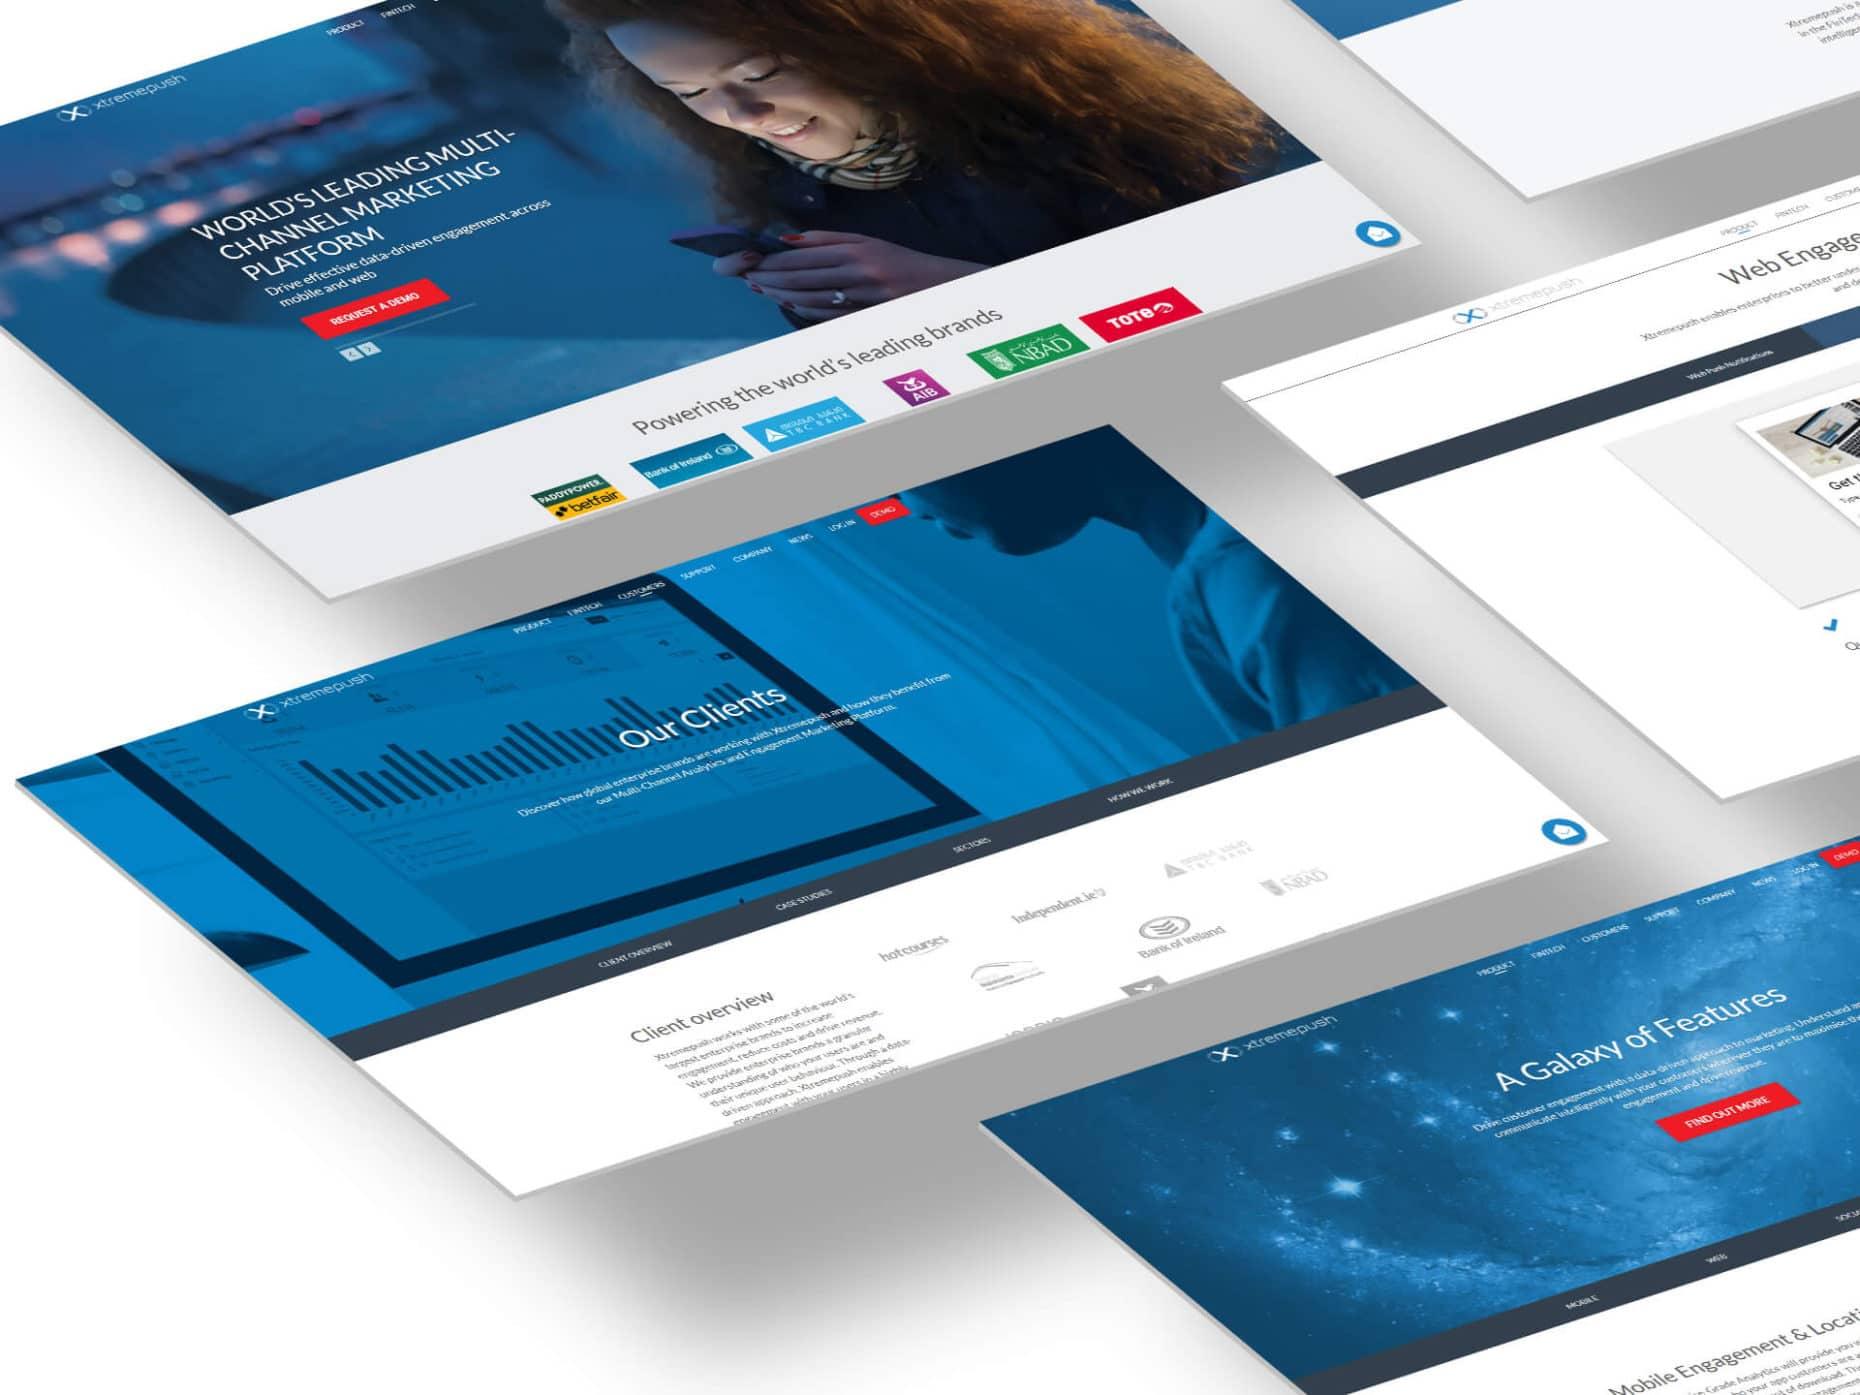 Xtremepush Website